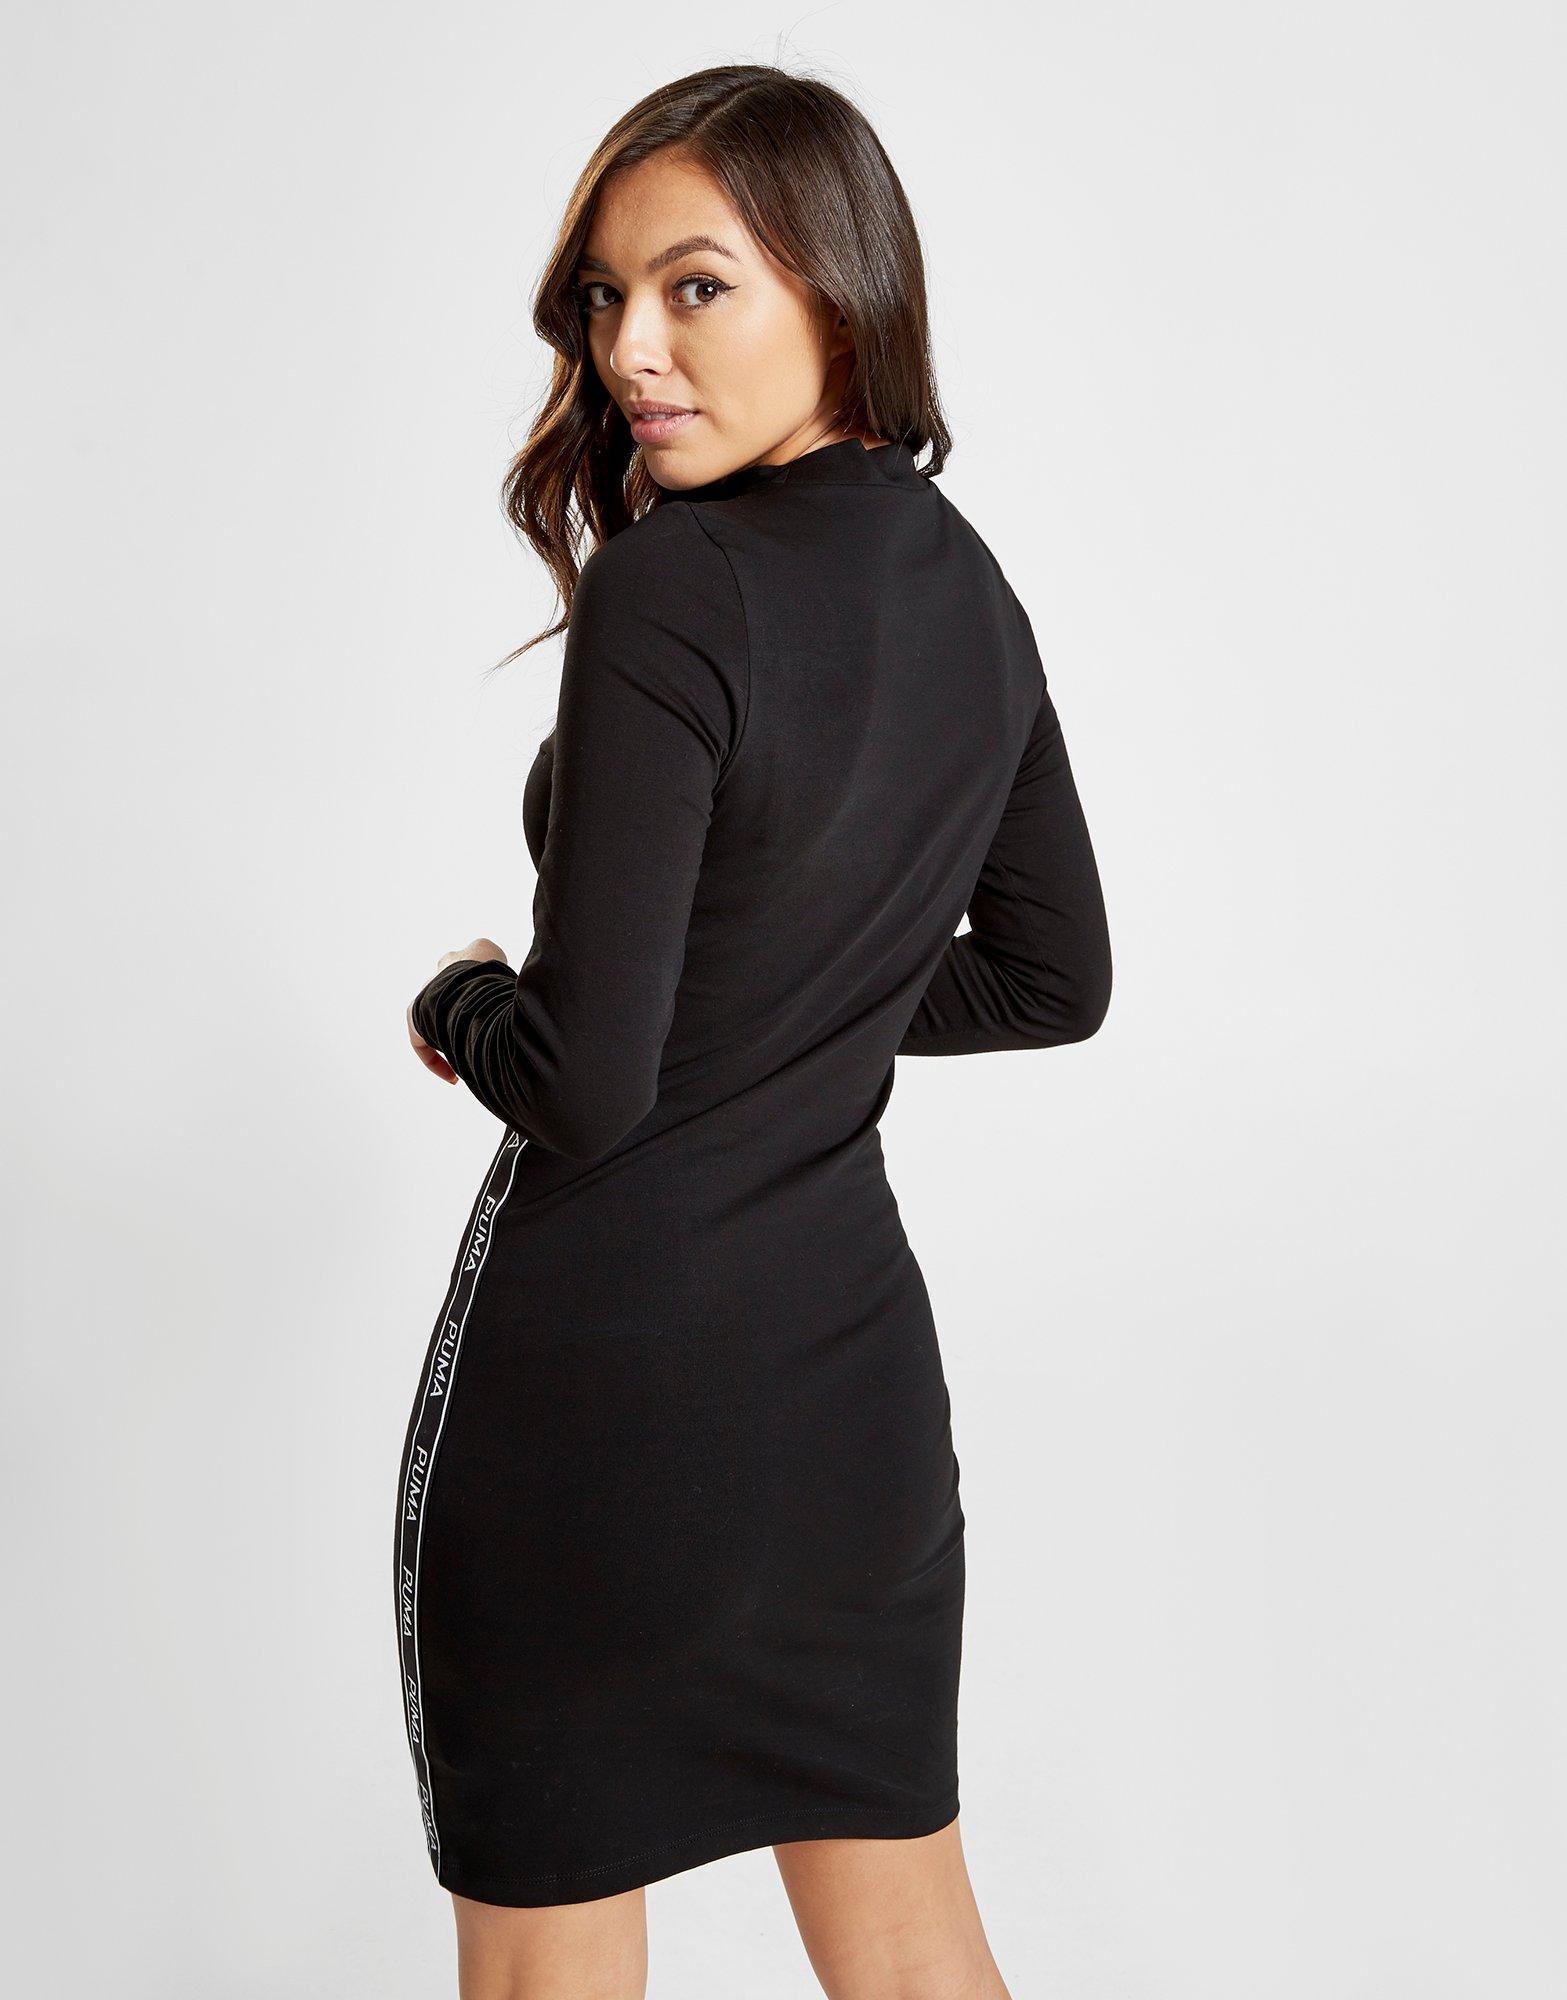 High Collar Dresses for Women